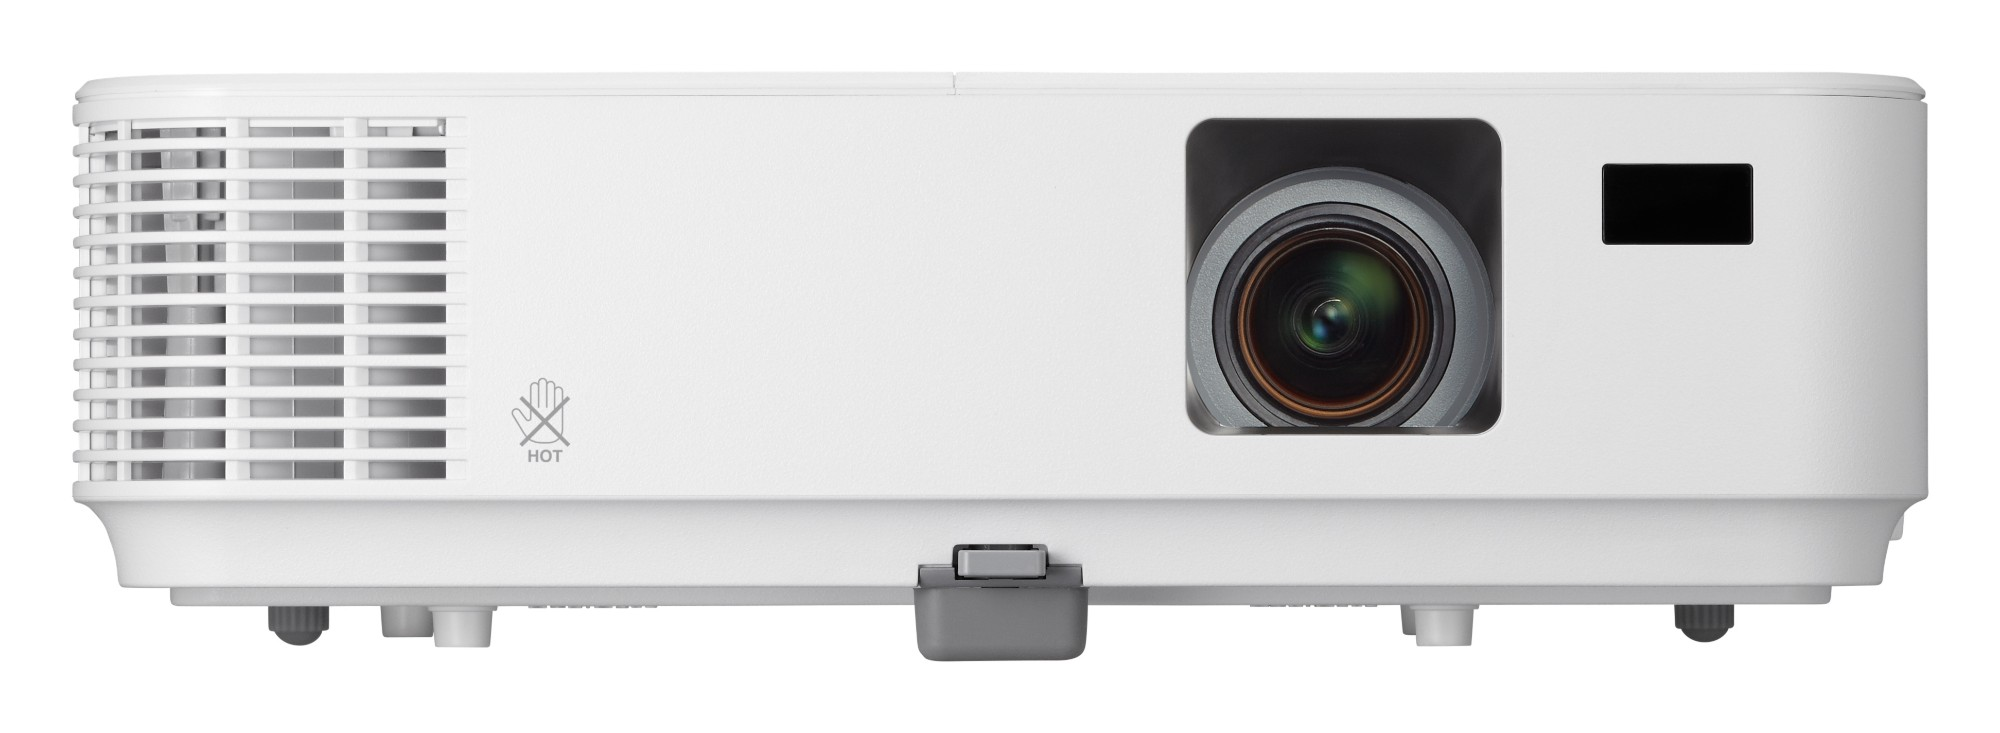 NEC V302H Desktop projector 3000ANSI lumens DLP 1080p (1920x1080) 3D White data projector